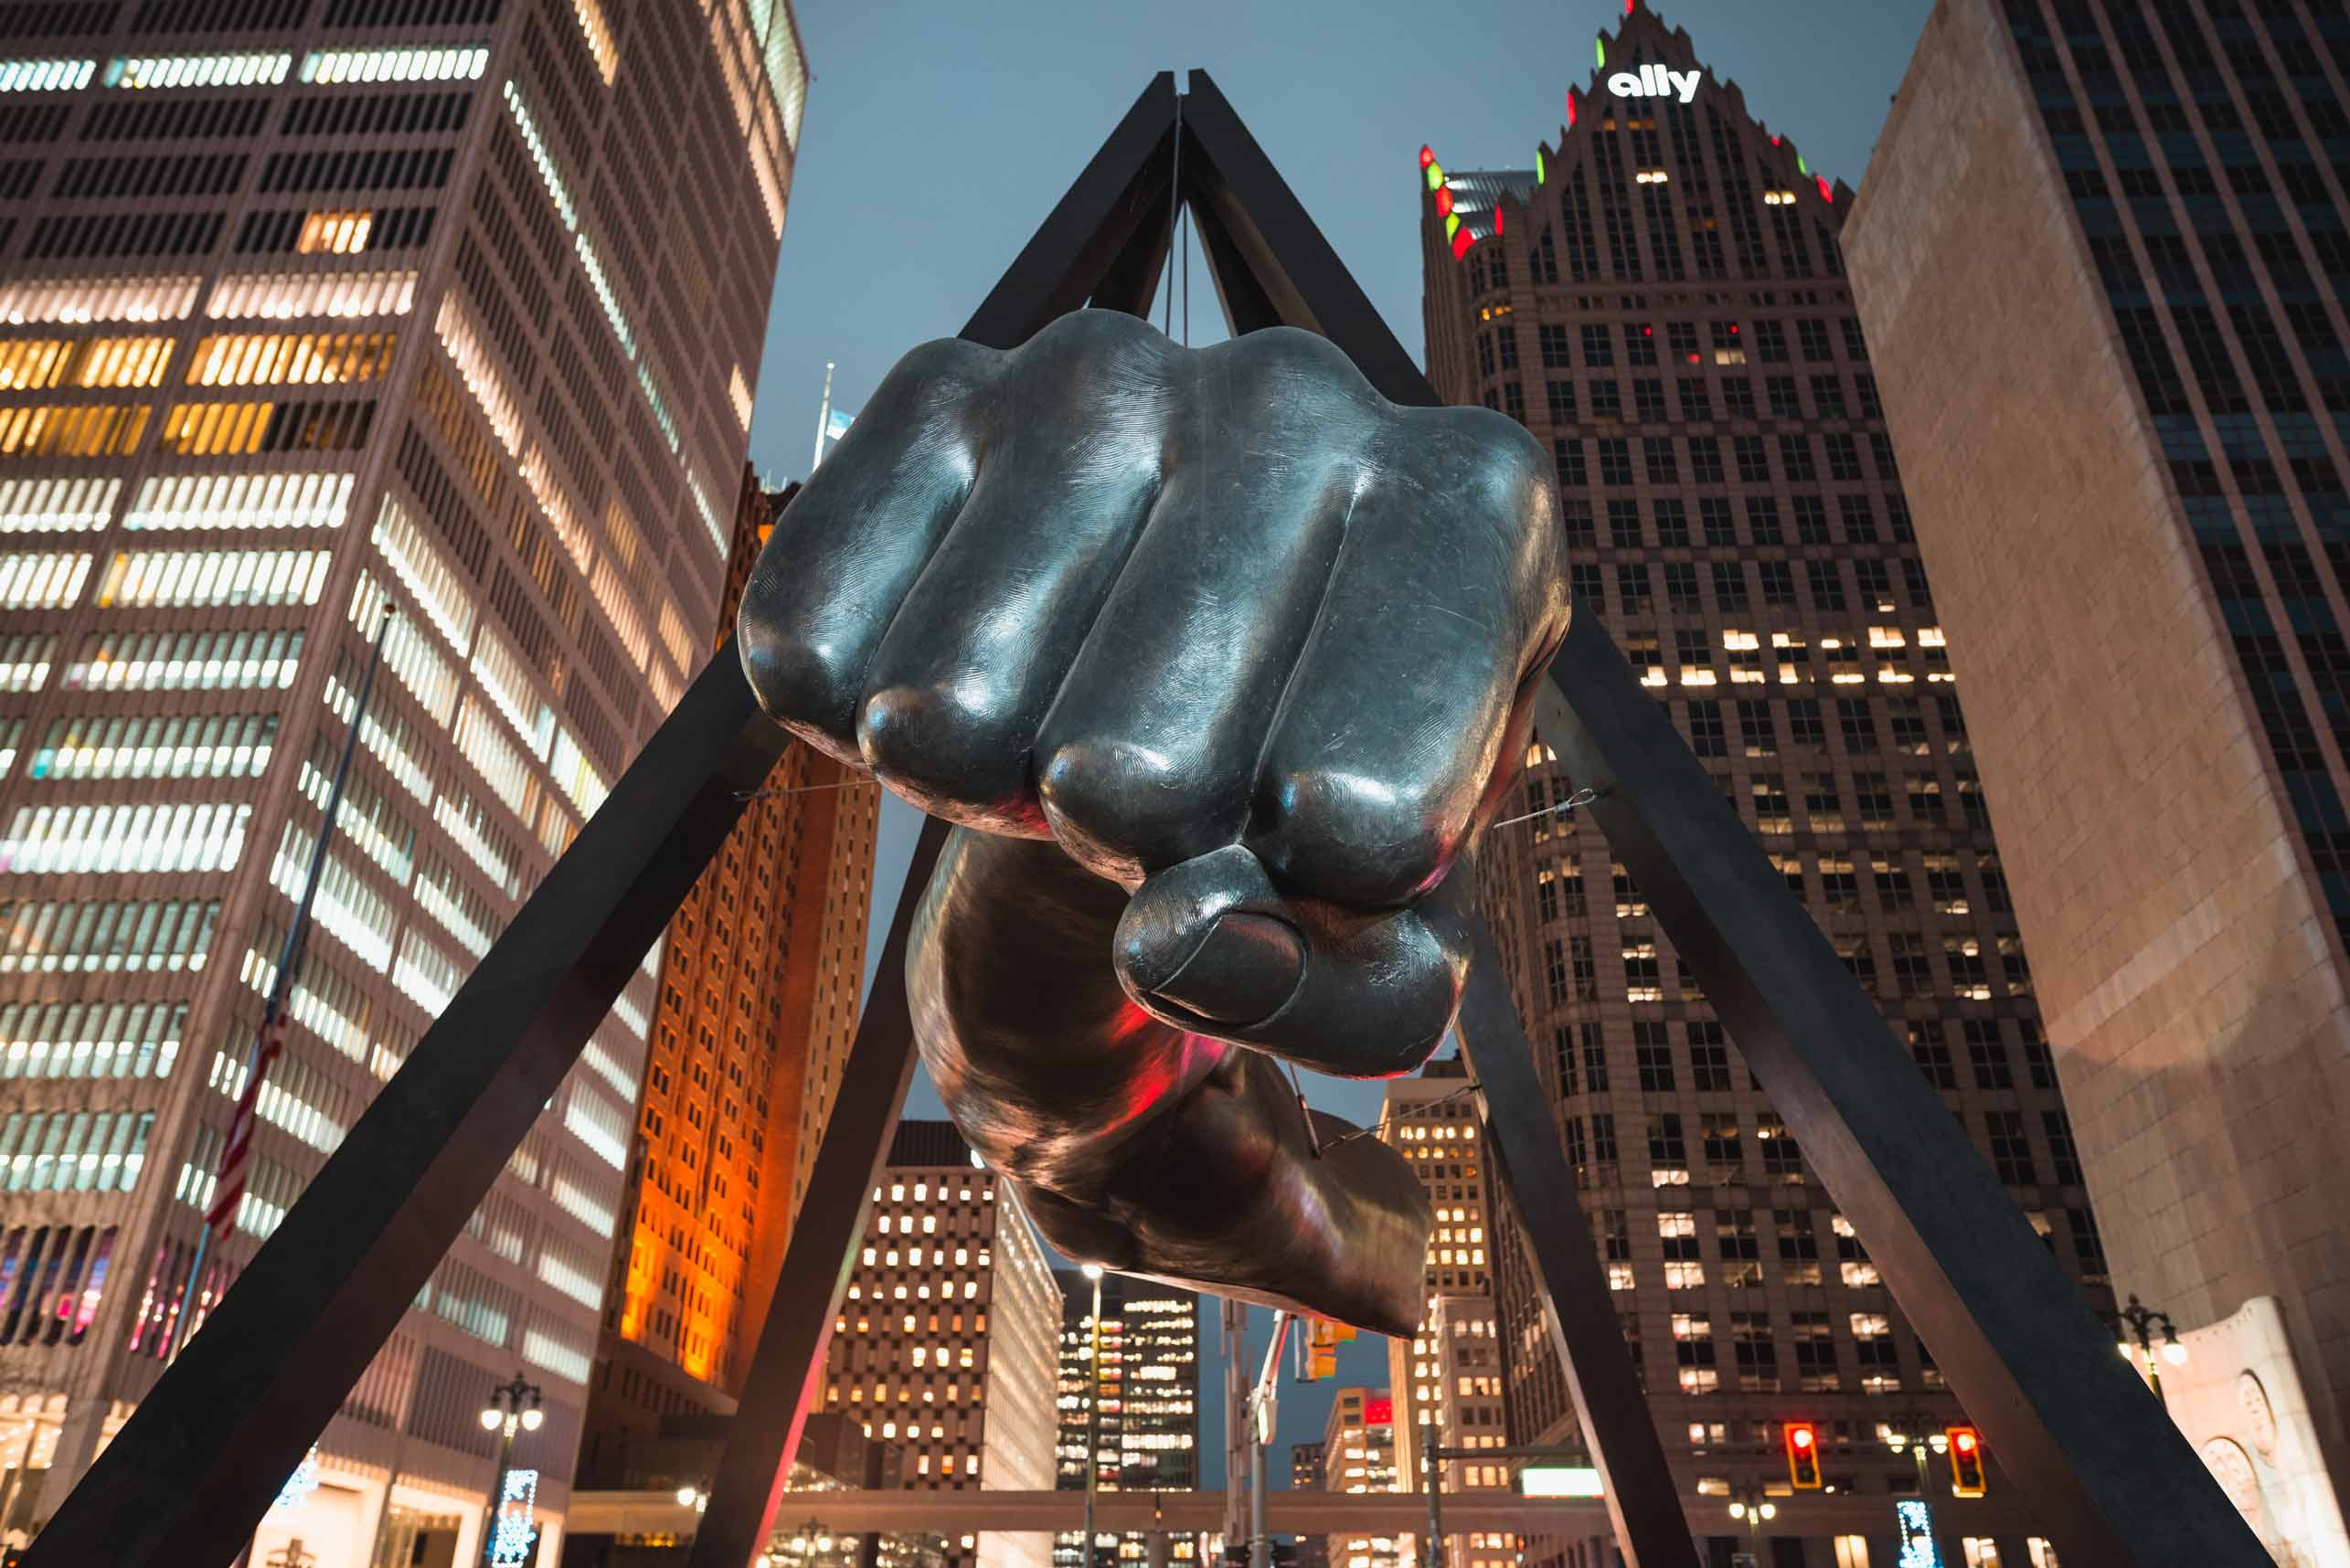 Joe Louis Monument (The Fist)